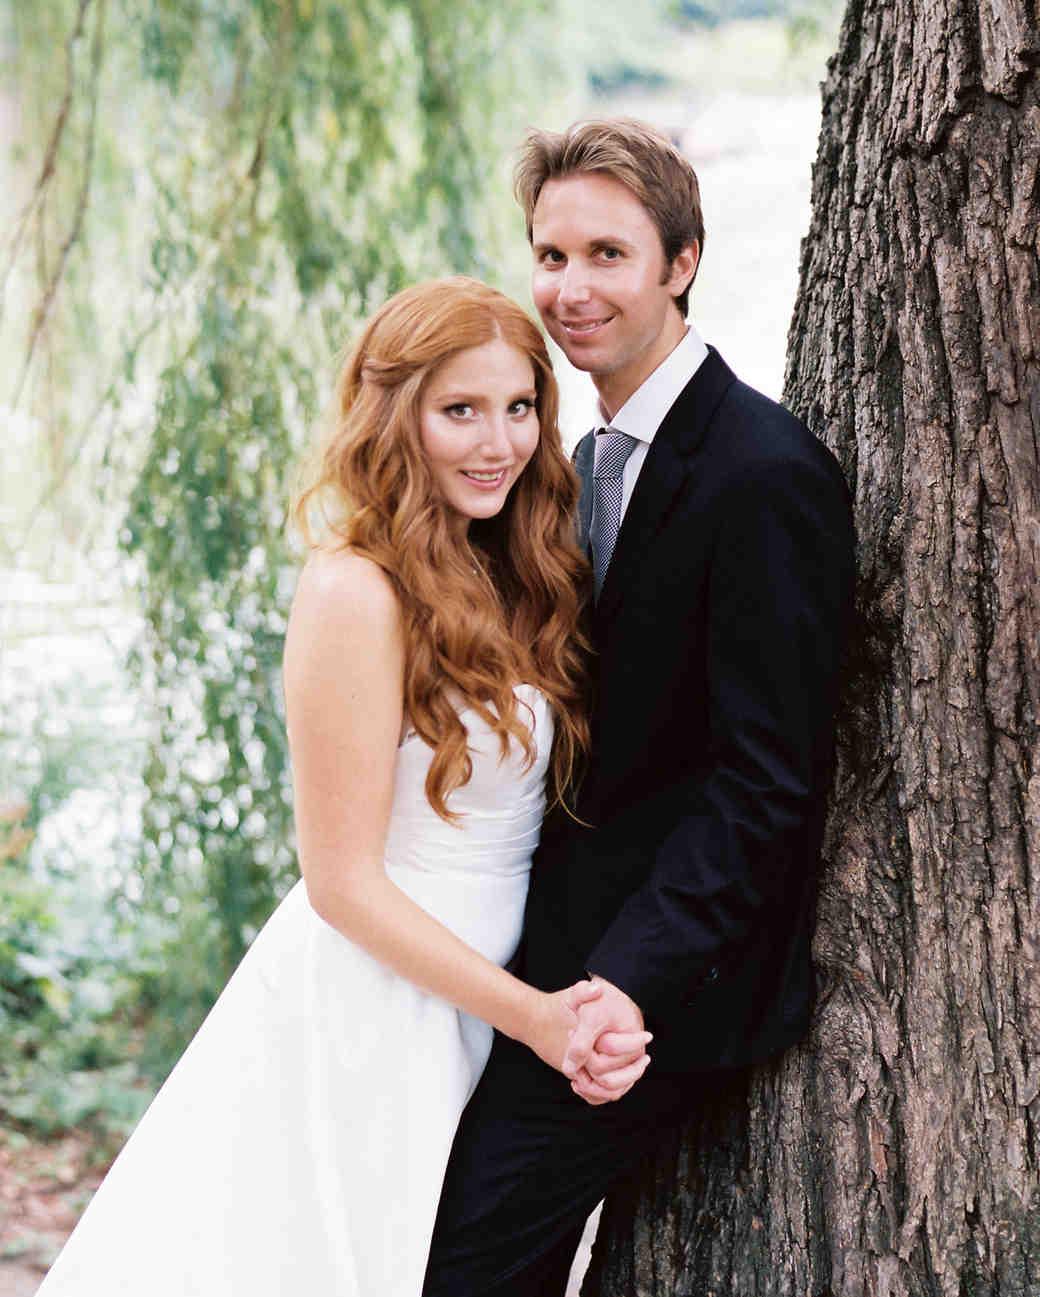 lilly-sean-wedding-couple-00129-s112089-0815.jpg